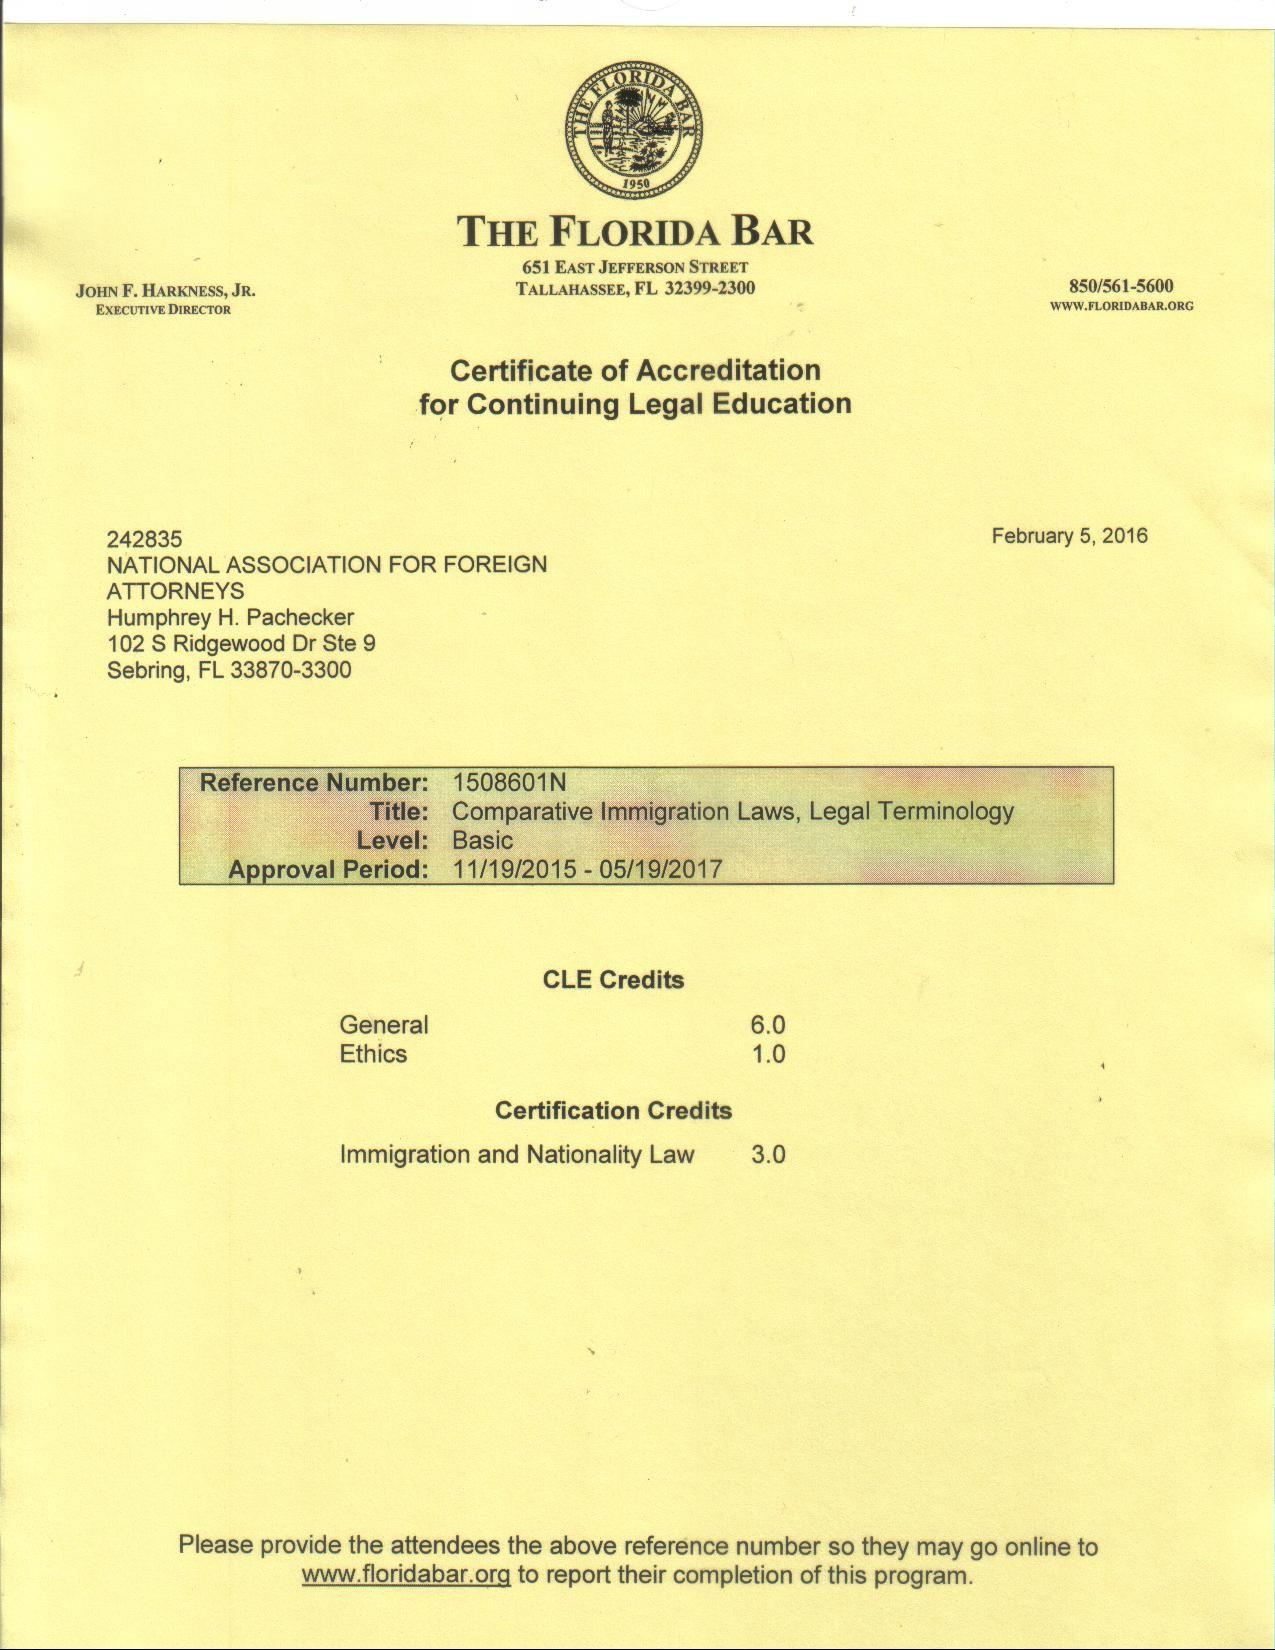 NAFA OCCUPATIONAL LICENSE 013